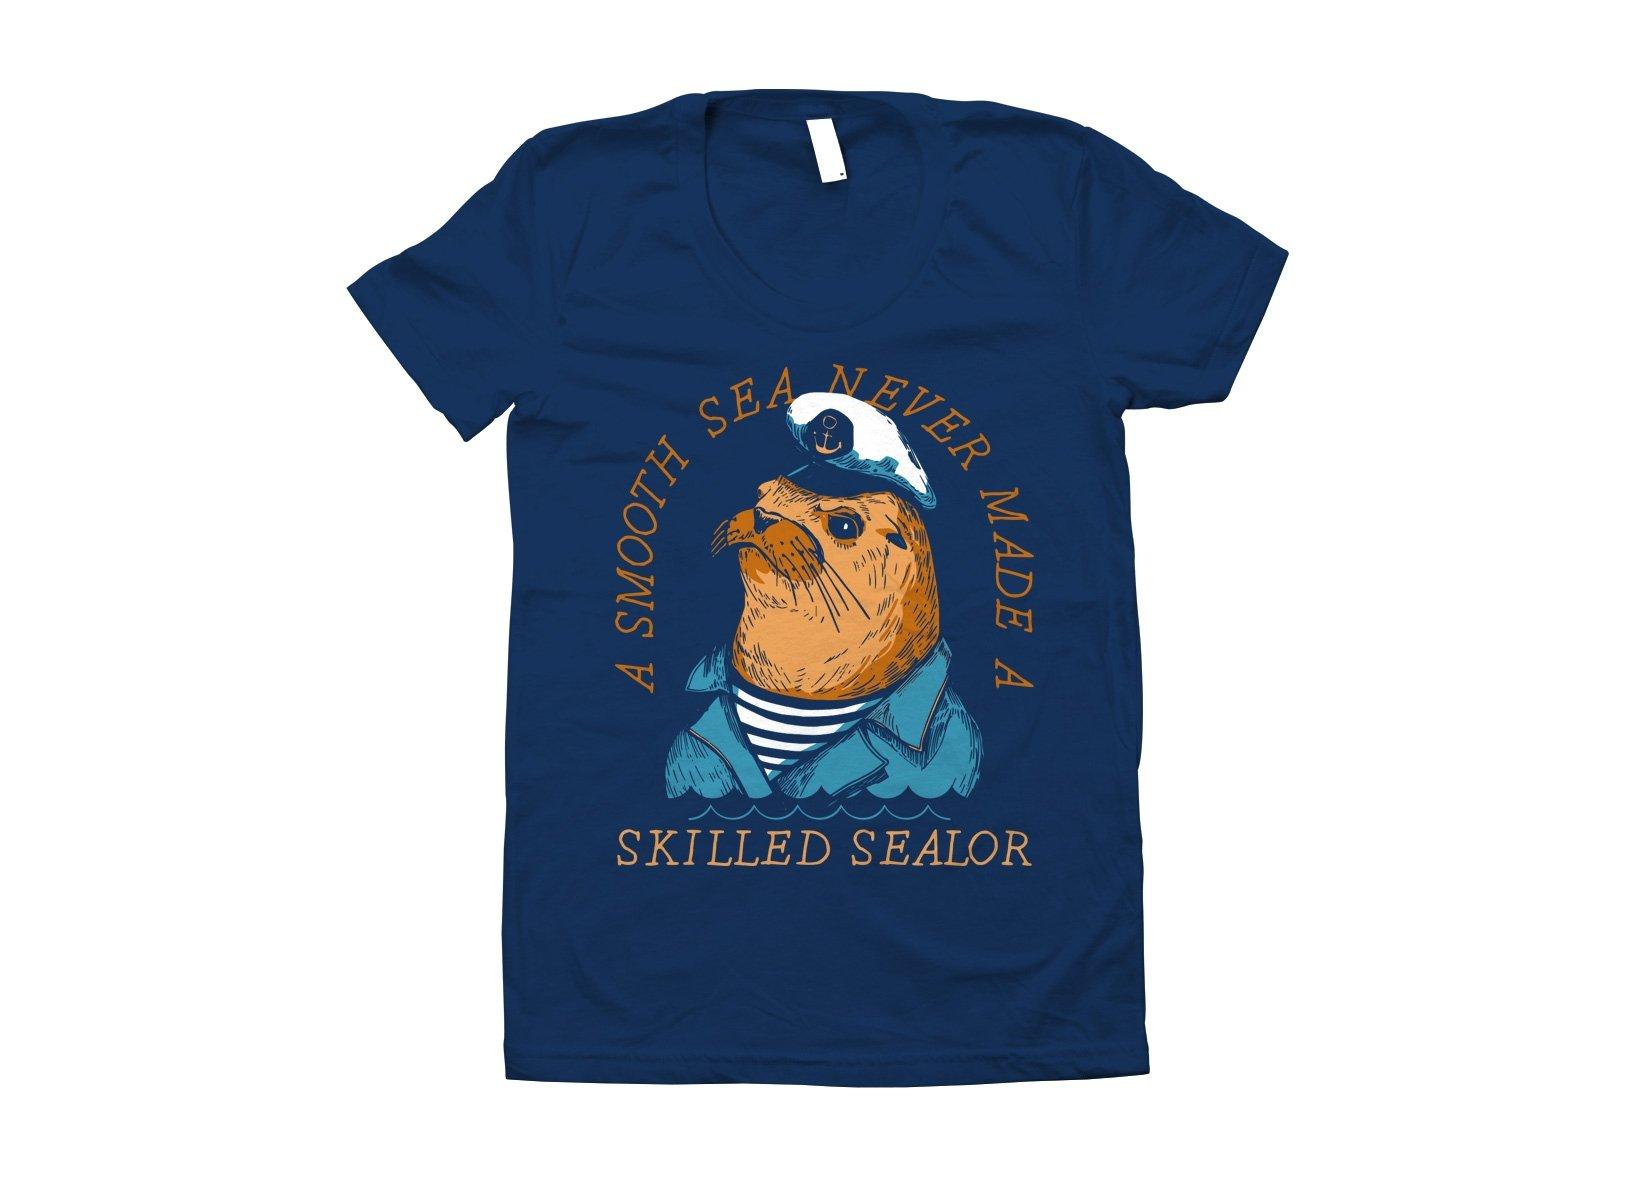 Skilled Sealor on Juniors T-Shirt